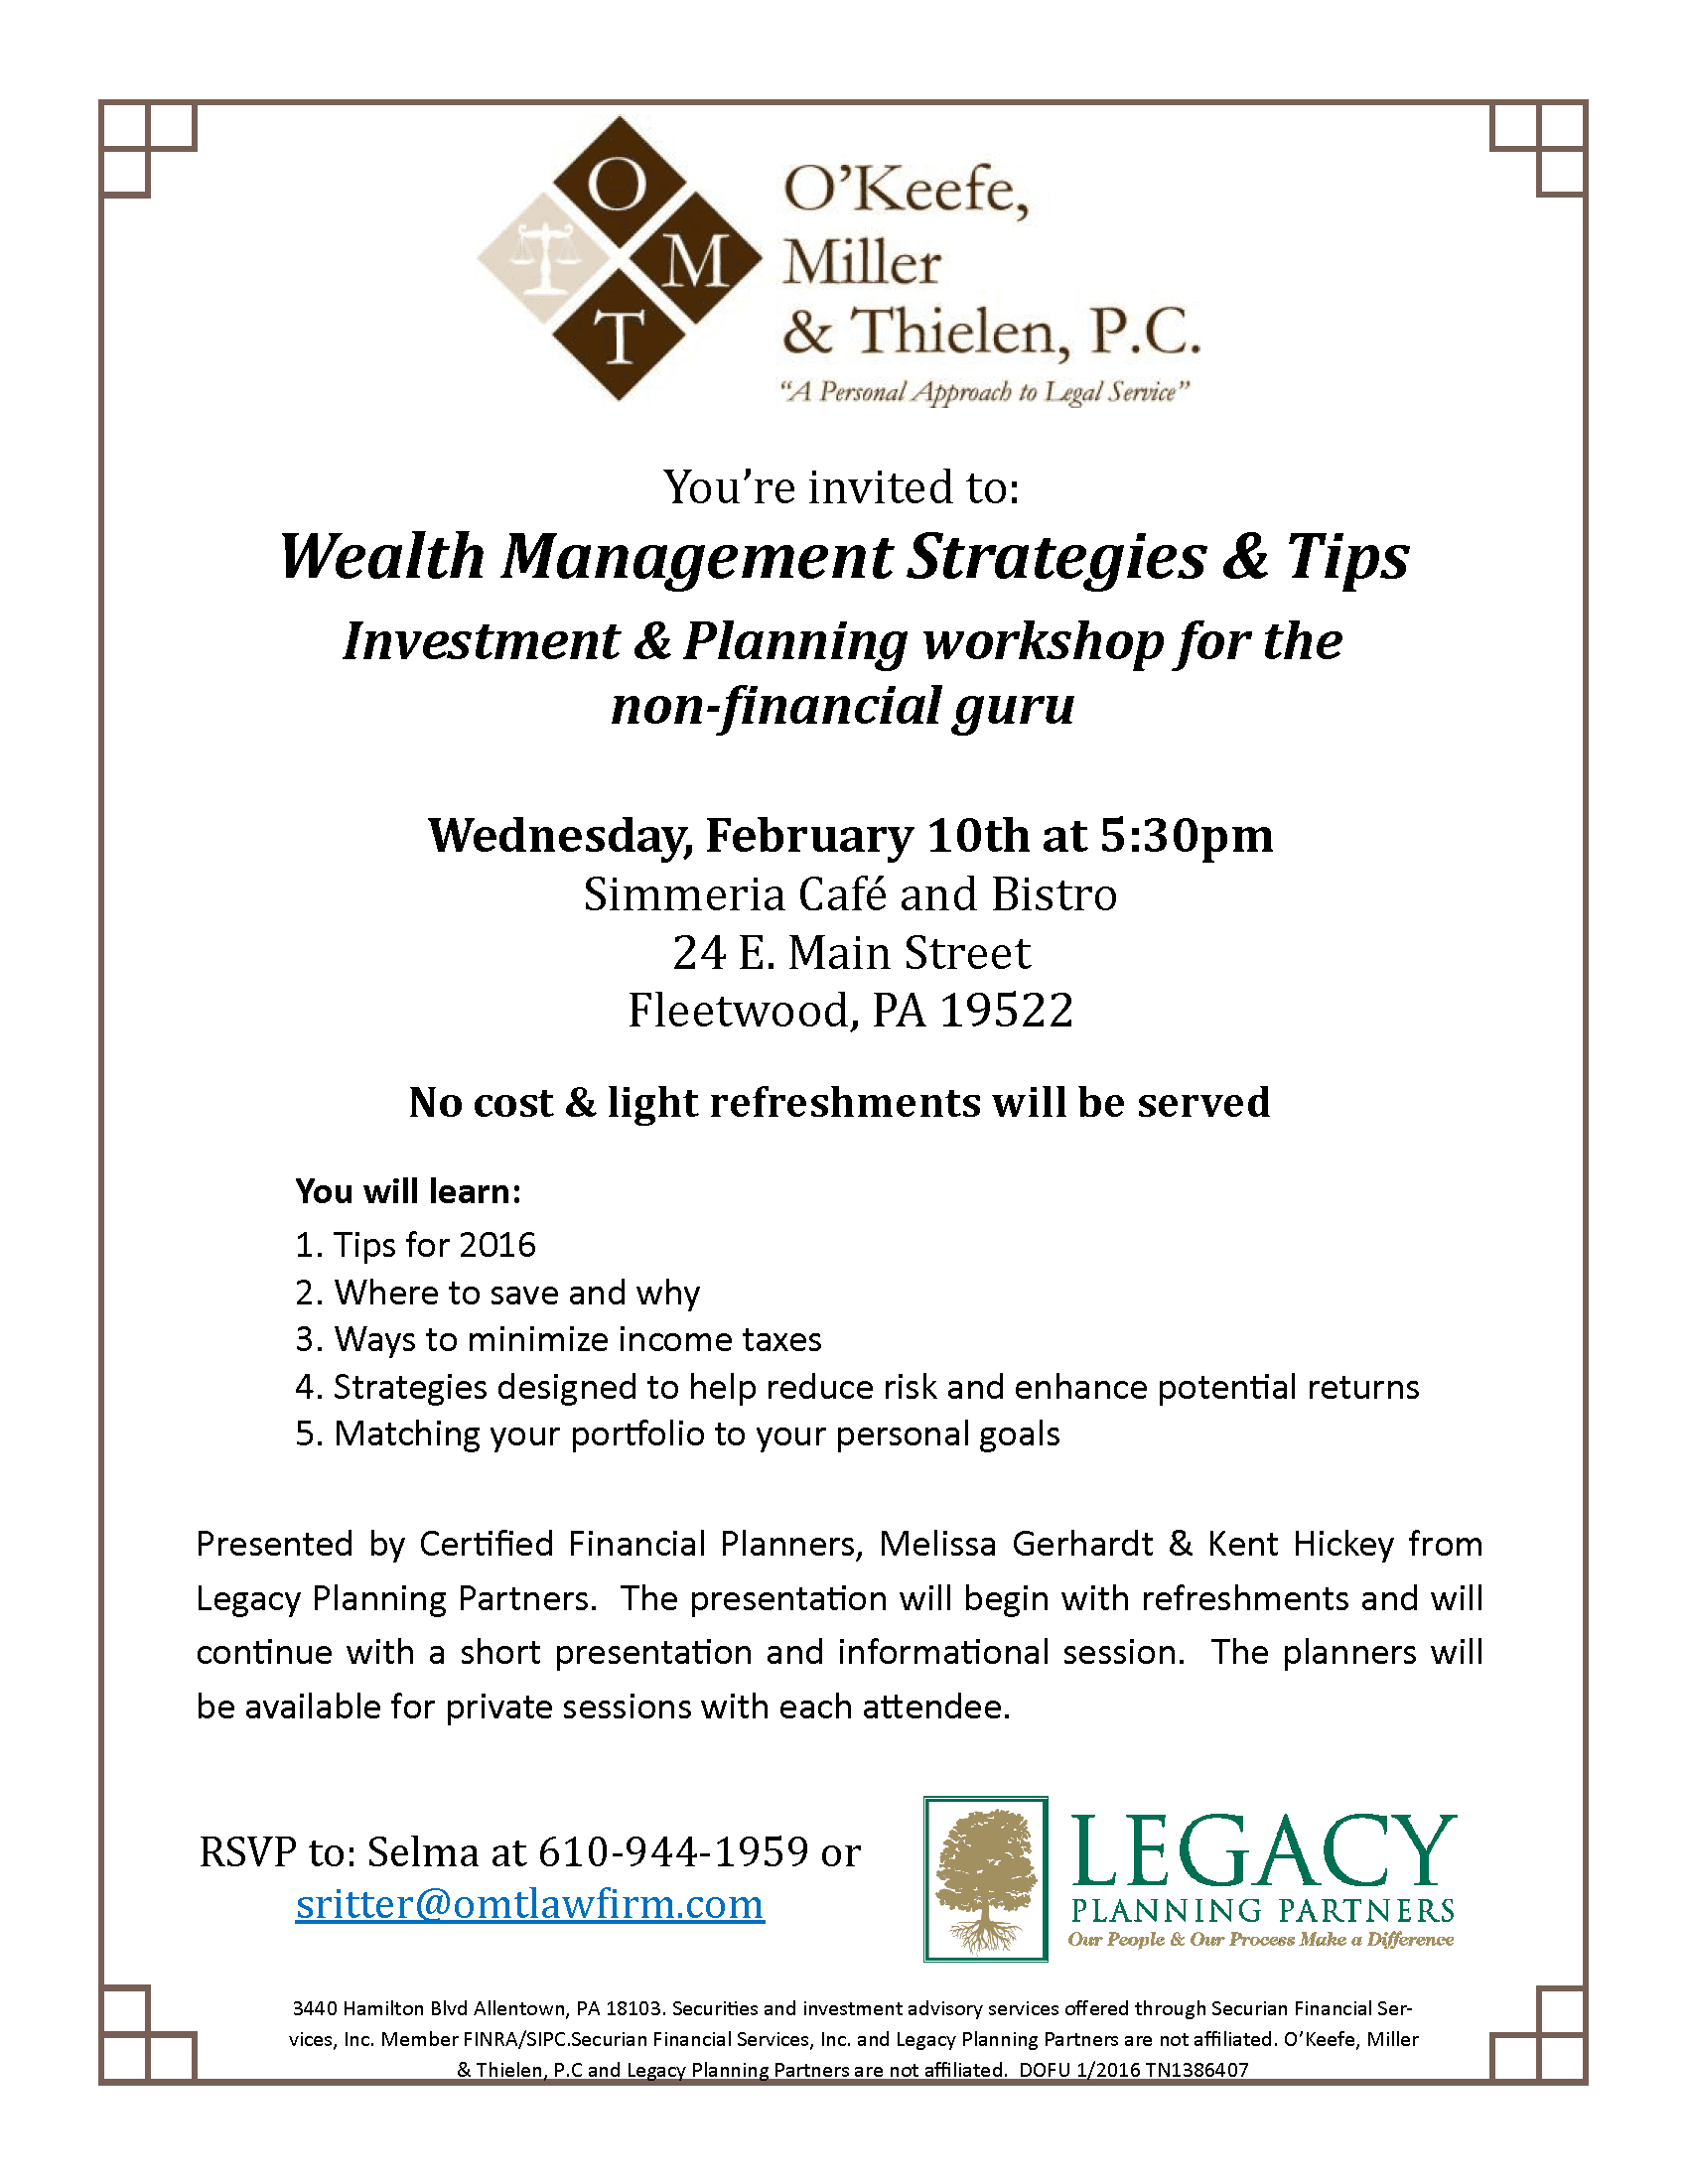 Wealth Management Strategies & Tips